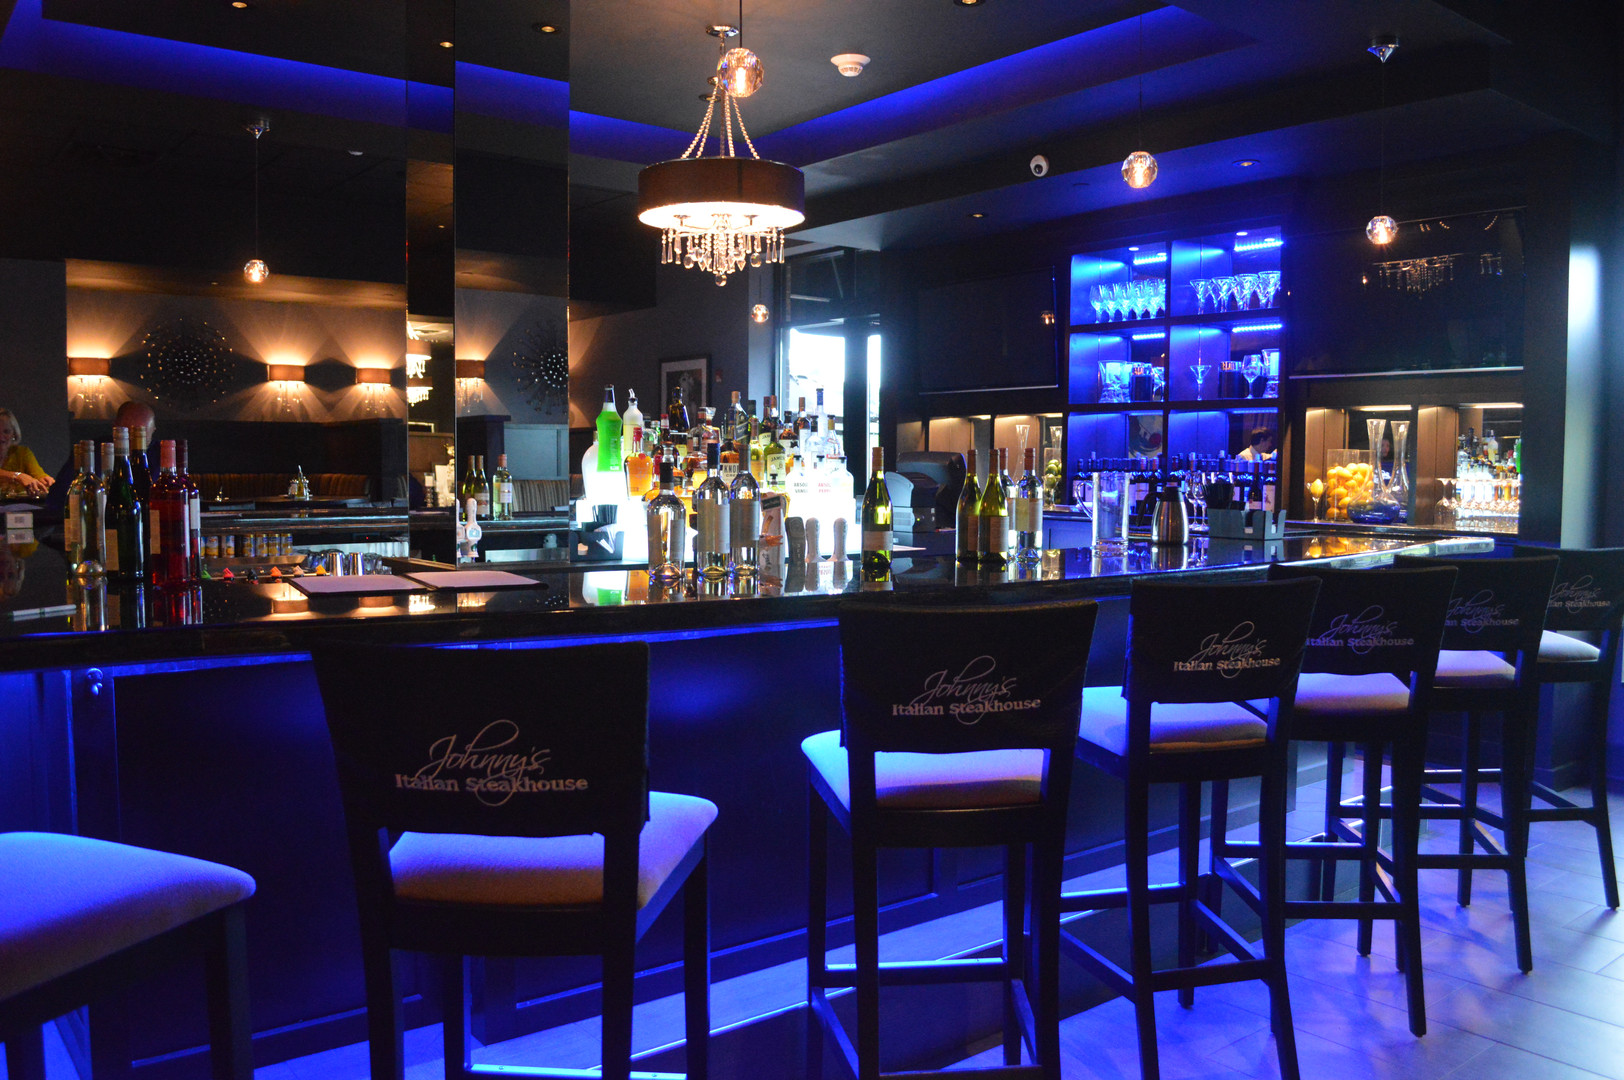 Bar at Johnny's Italian Steakhouse